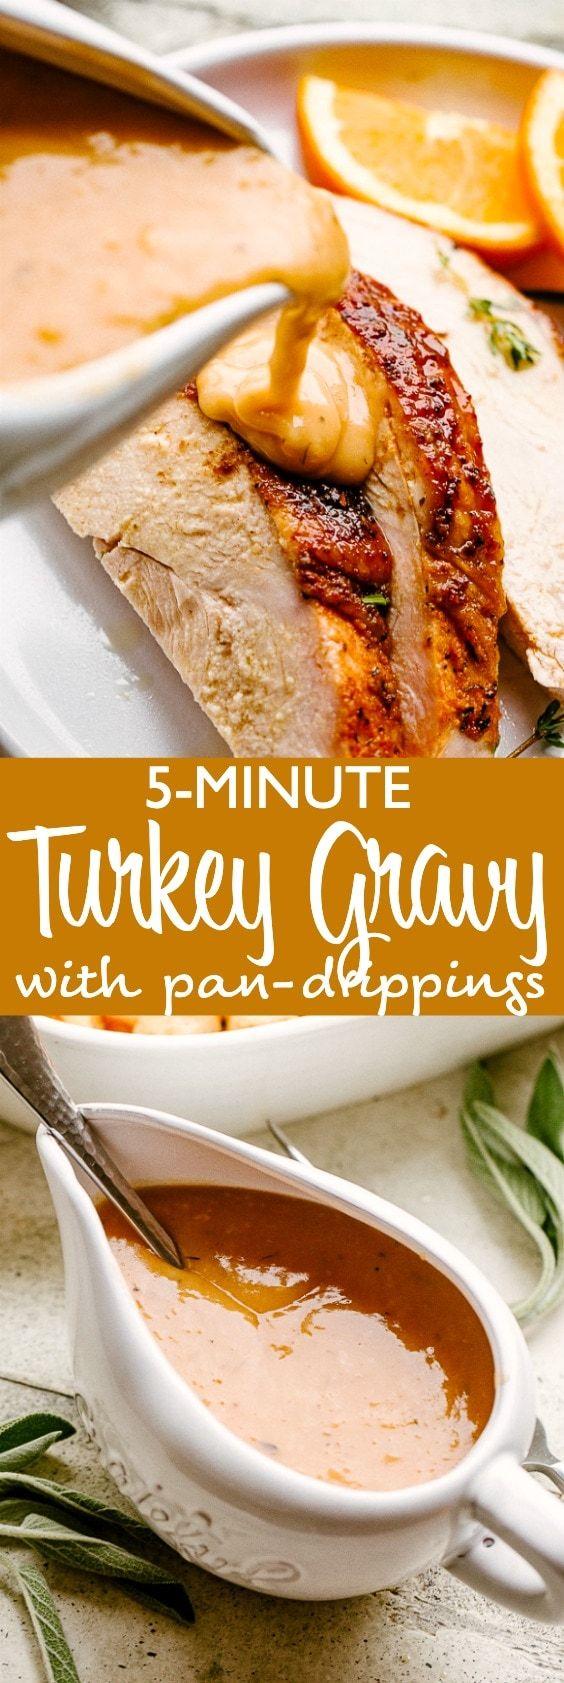 Easy Turkey Gravy Recipe with Pan Drippings | Diethood #turkeygravyfromdrippingseasy